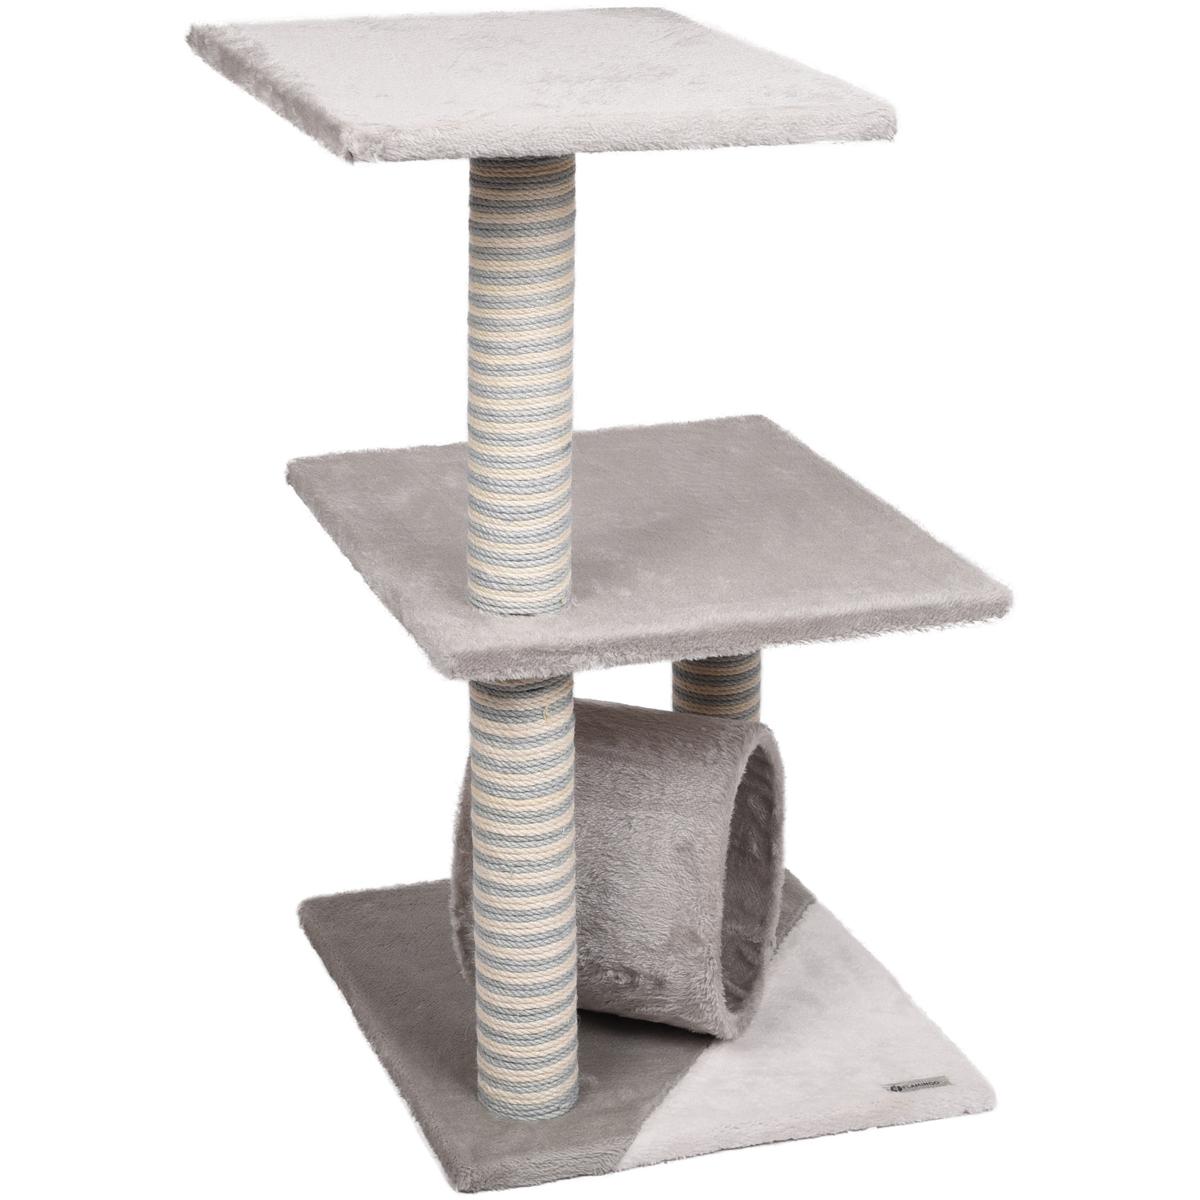 Krabpaal-Steve-40-x-40-x-76-cm-Flamingo-Grijs